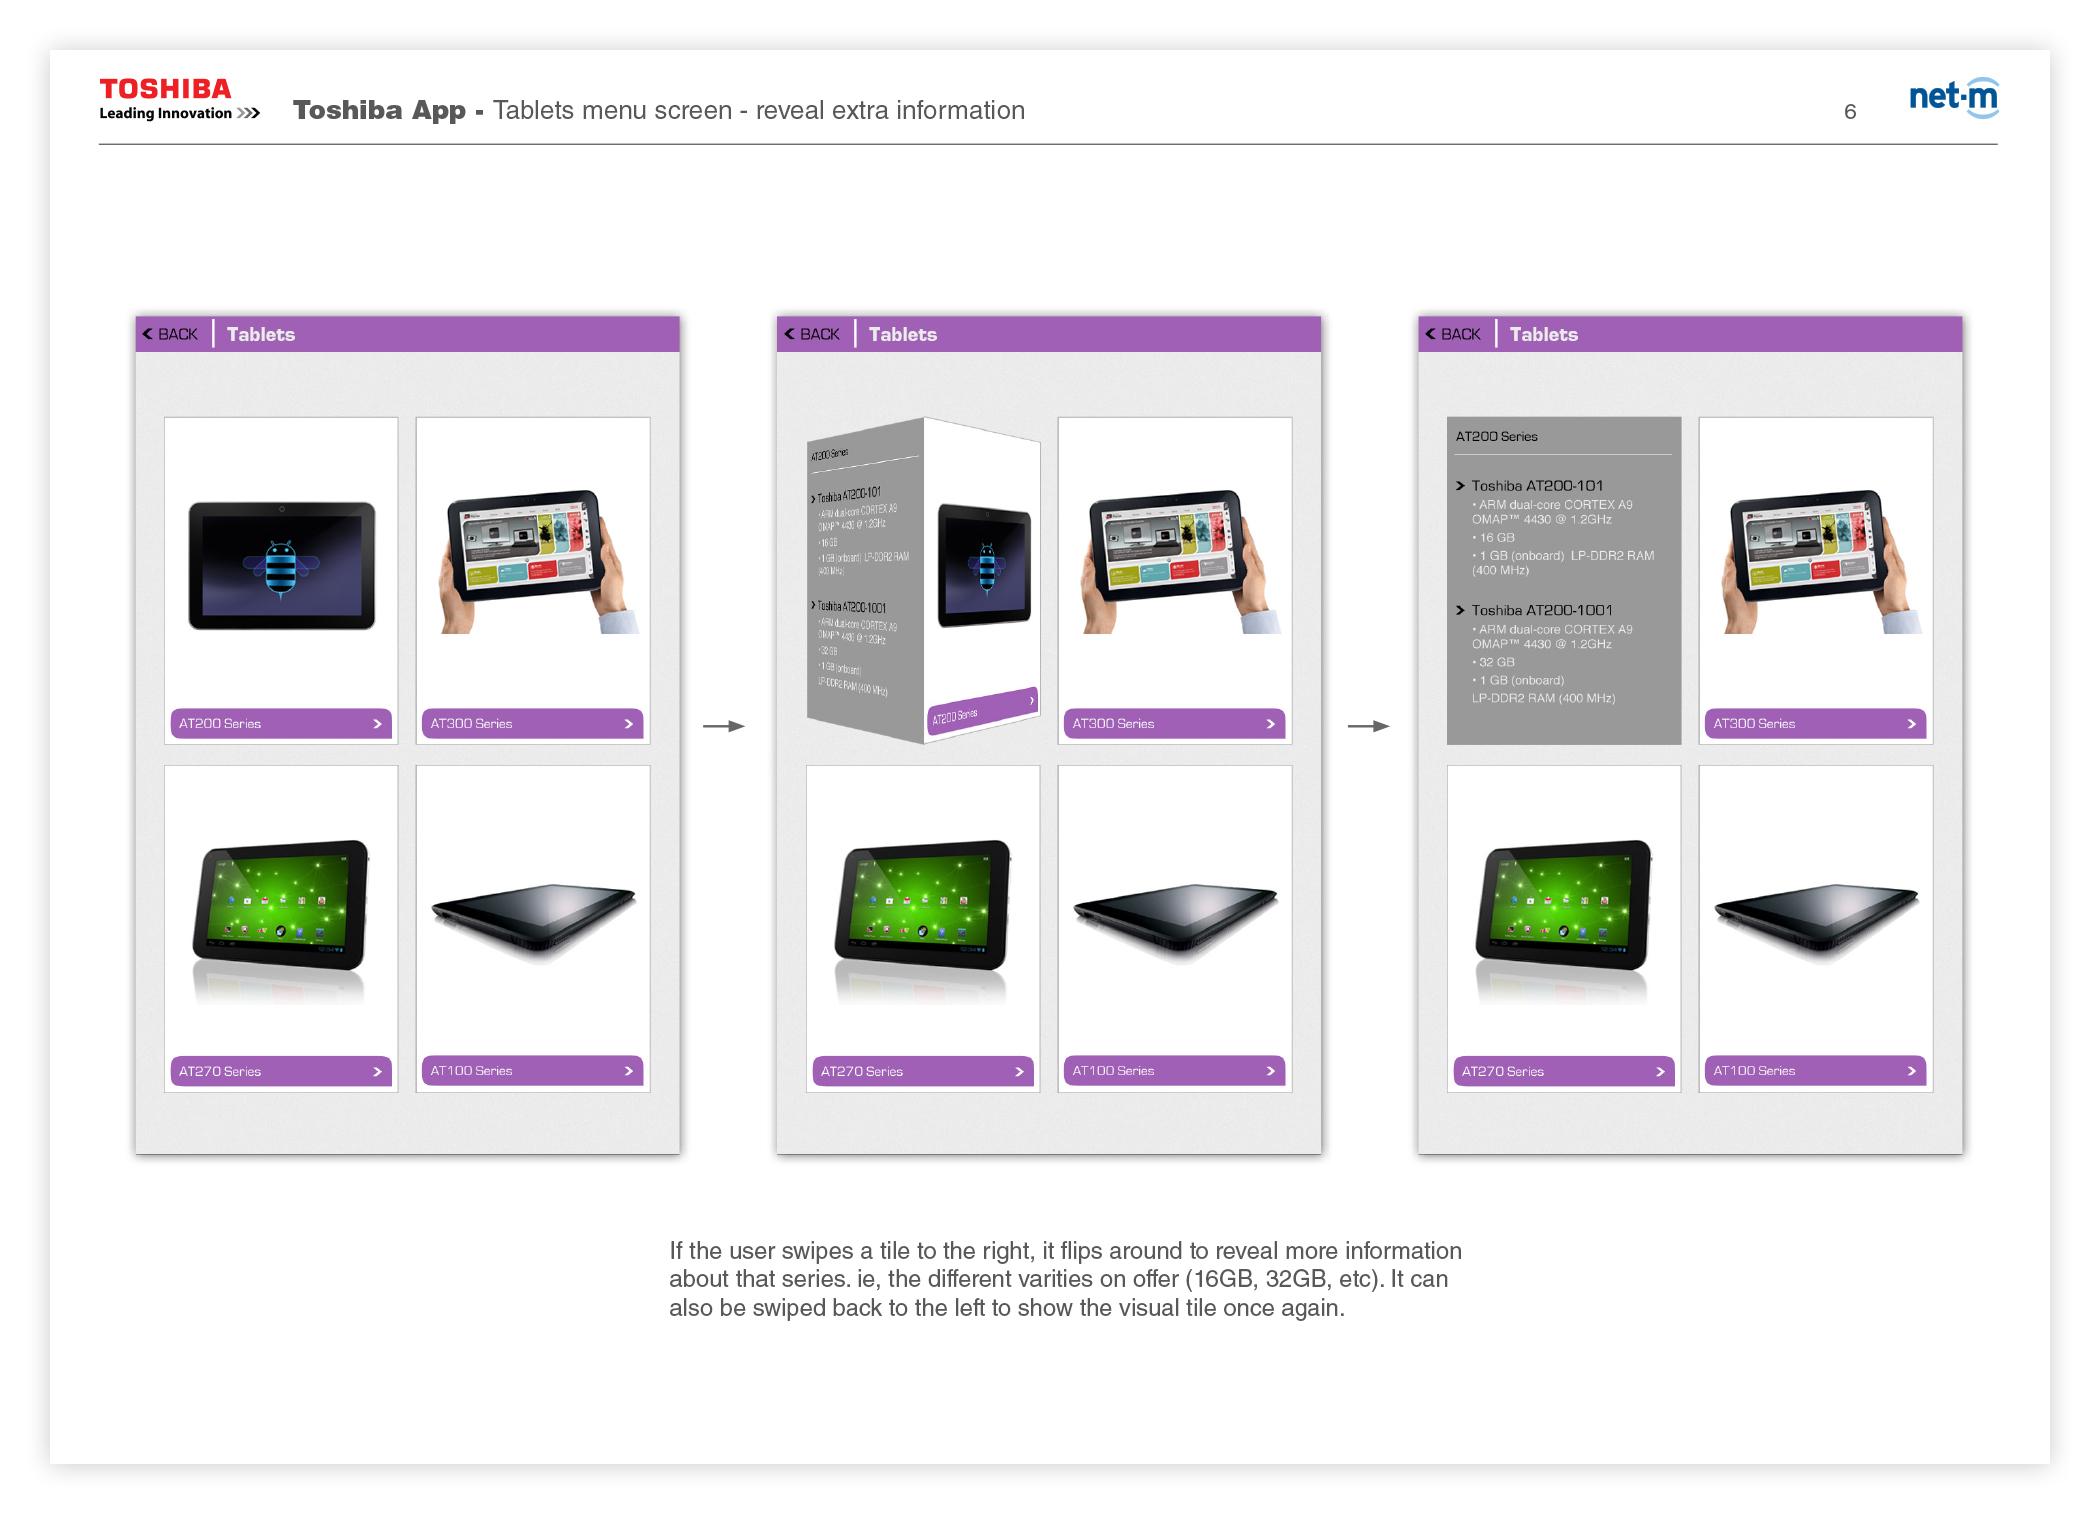 Toshiba_App_presentation_deck3.jpg